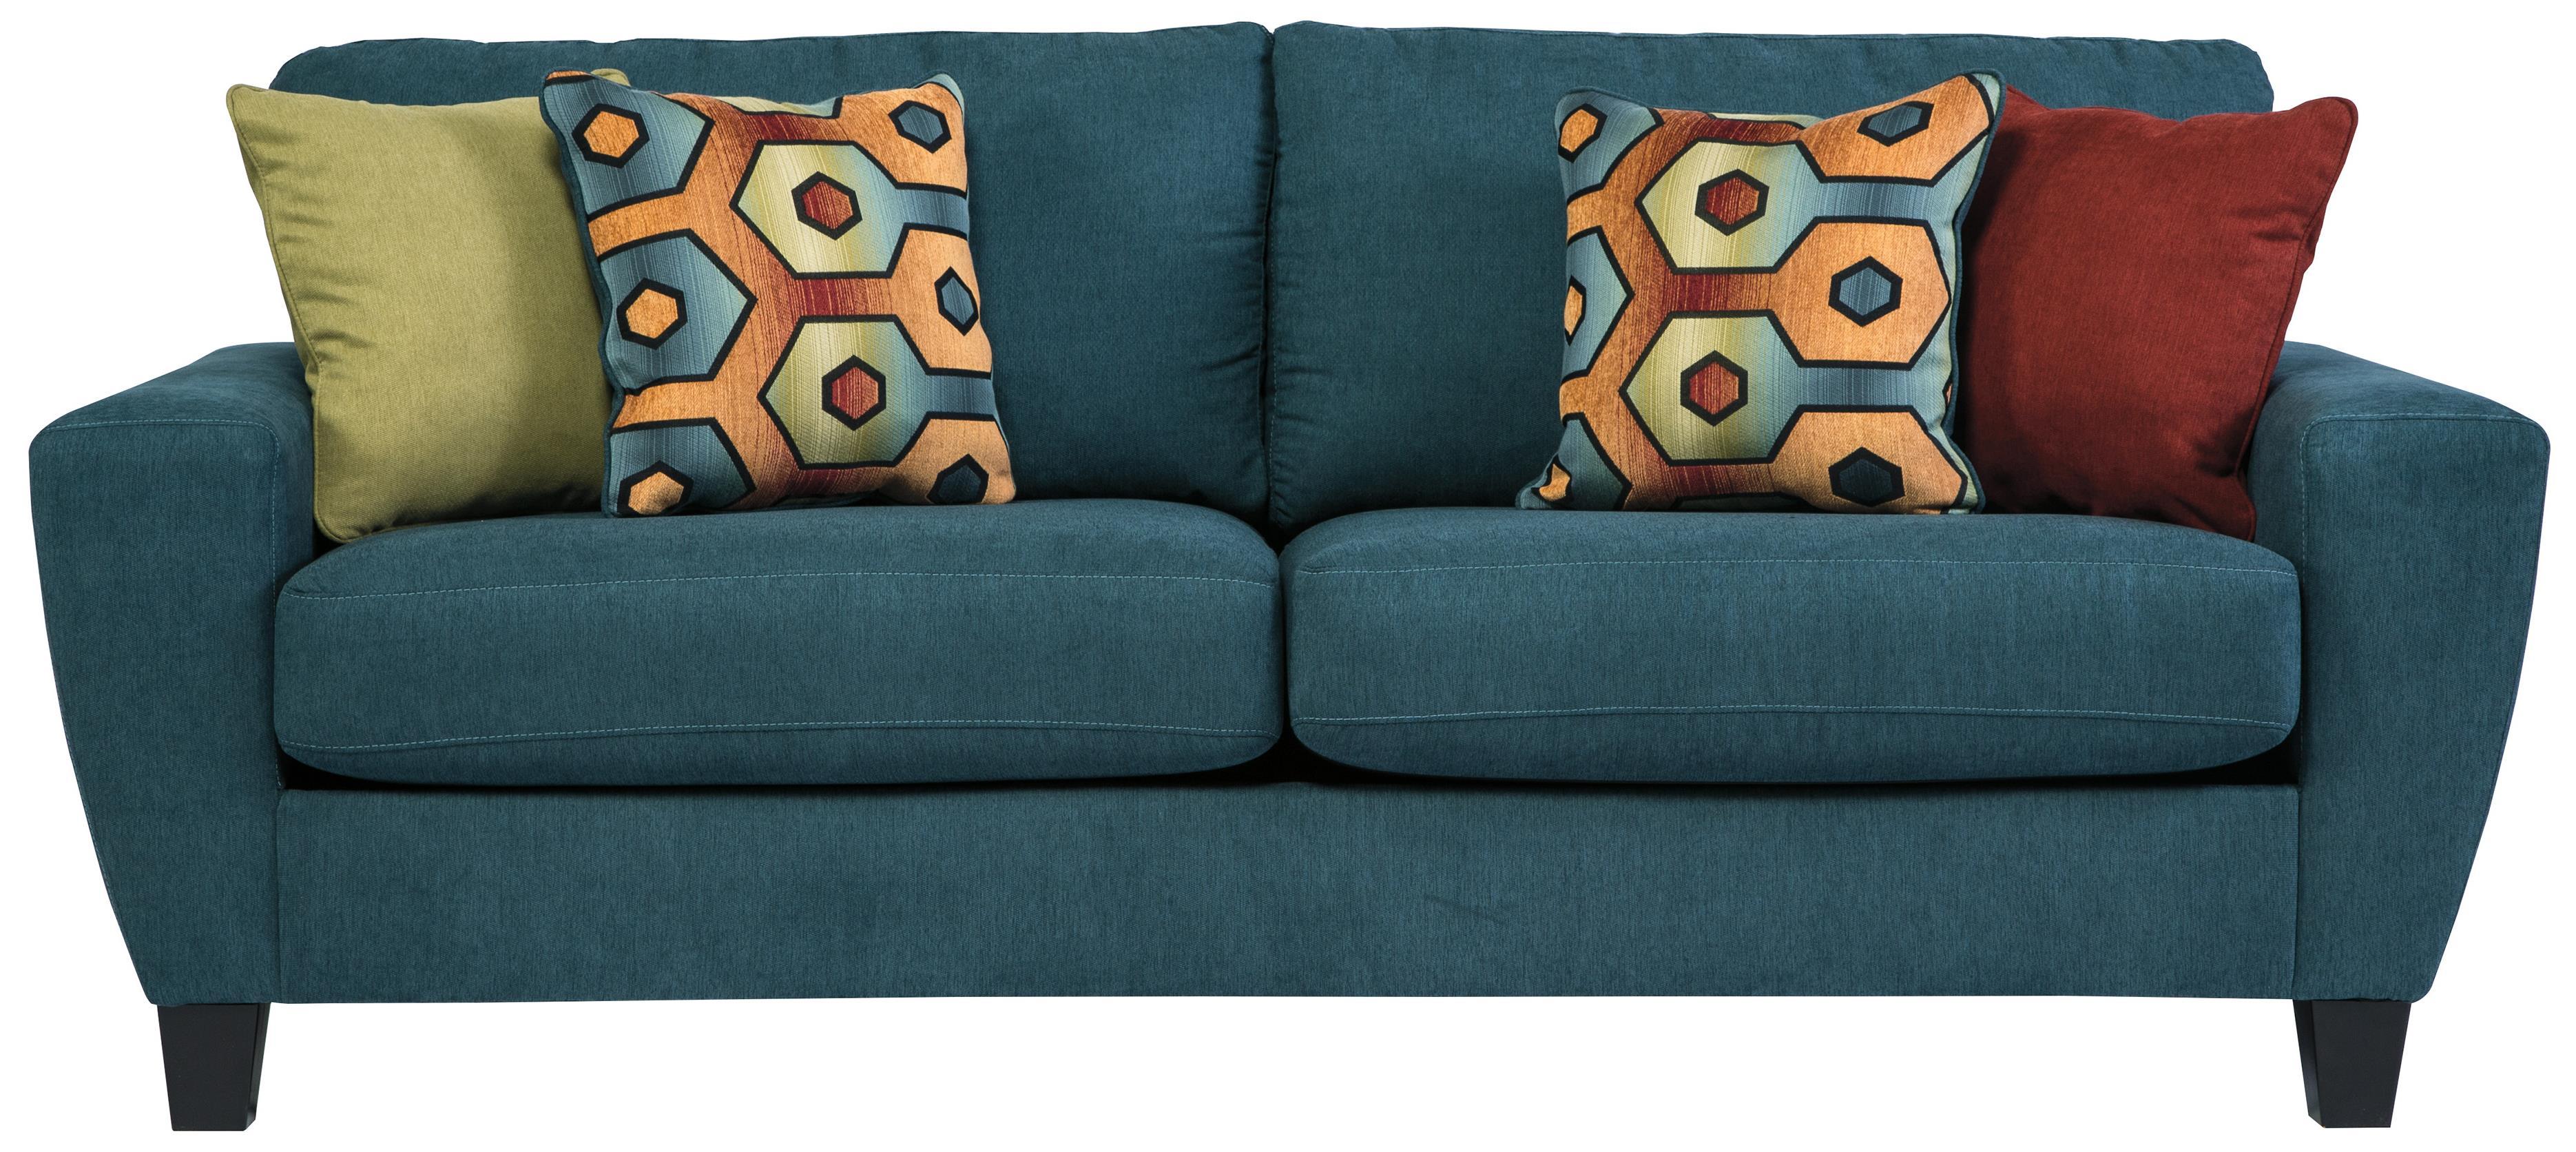 Signature Design by Ashley Sagen Sofa - Item Number: 9390238